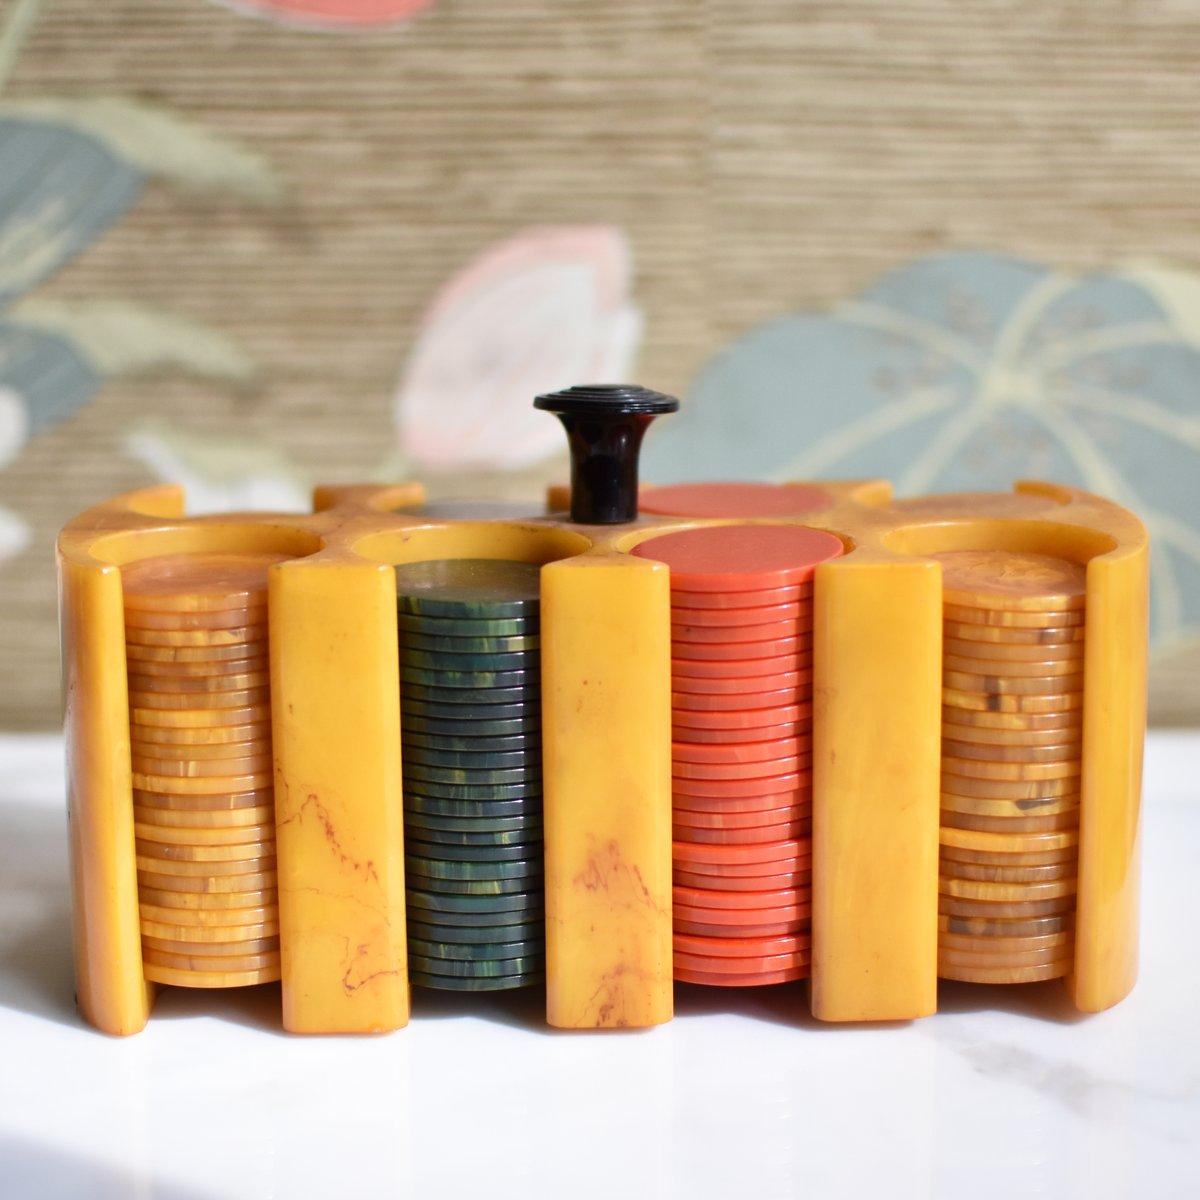 Image of Vintage Bakelite Poker Chip Set with Caddy